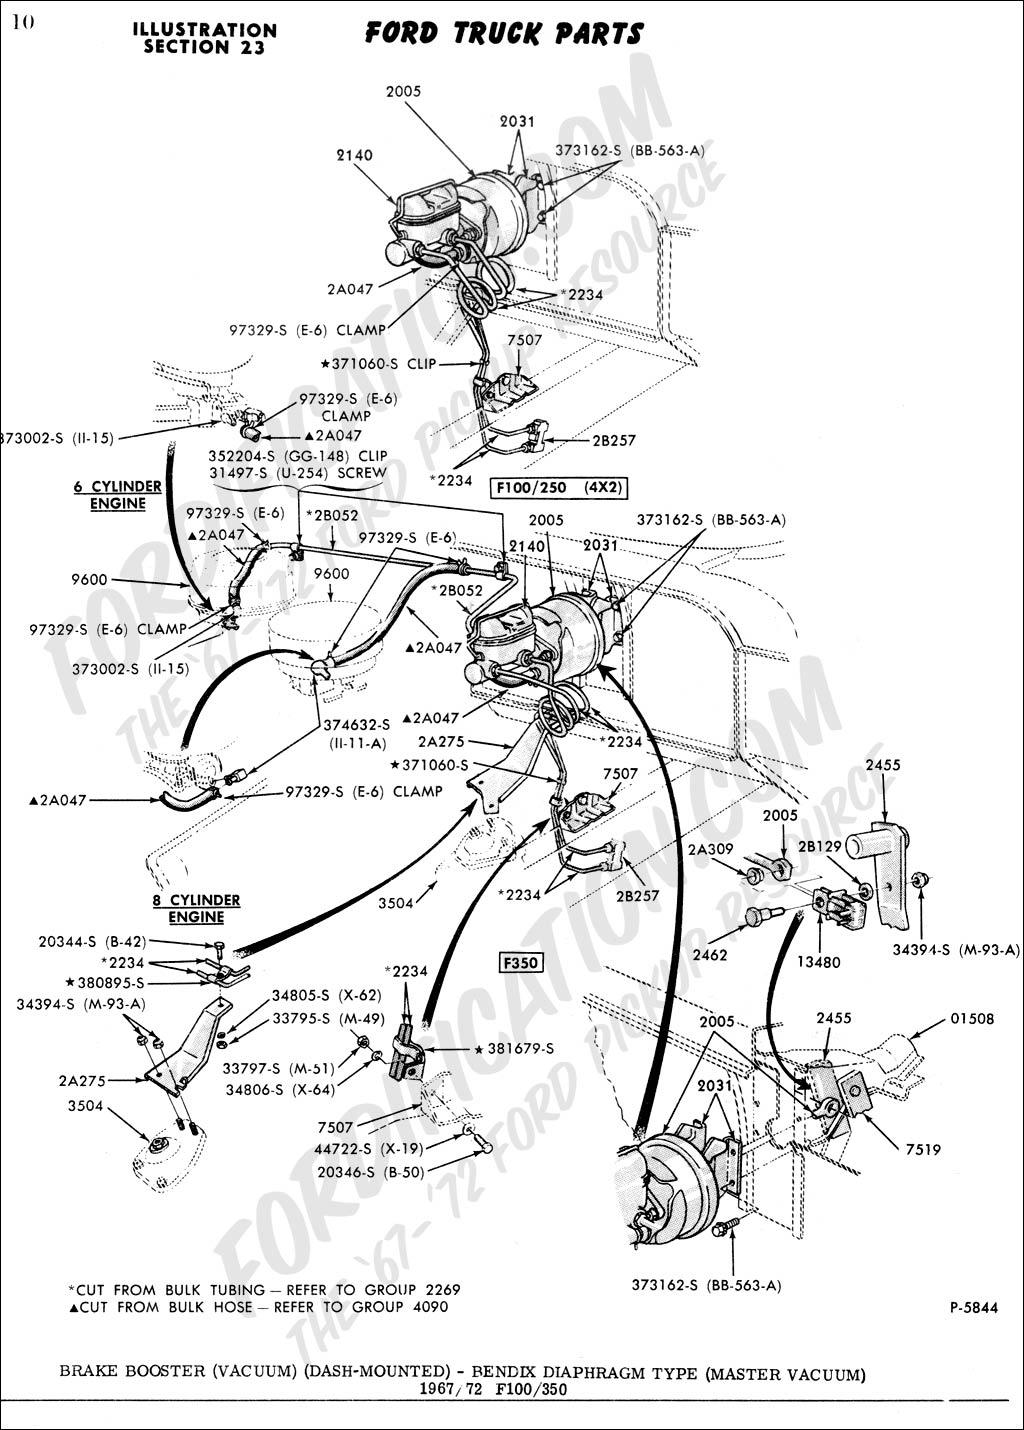 Ford Brakes Diagram